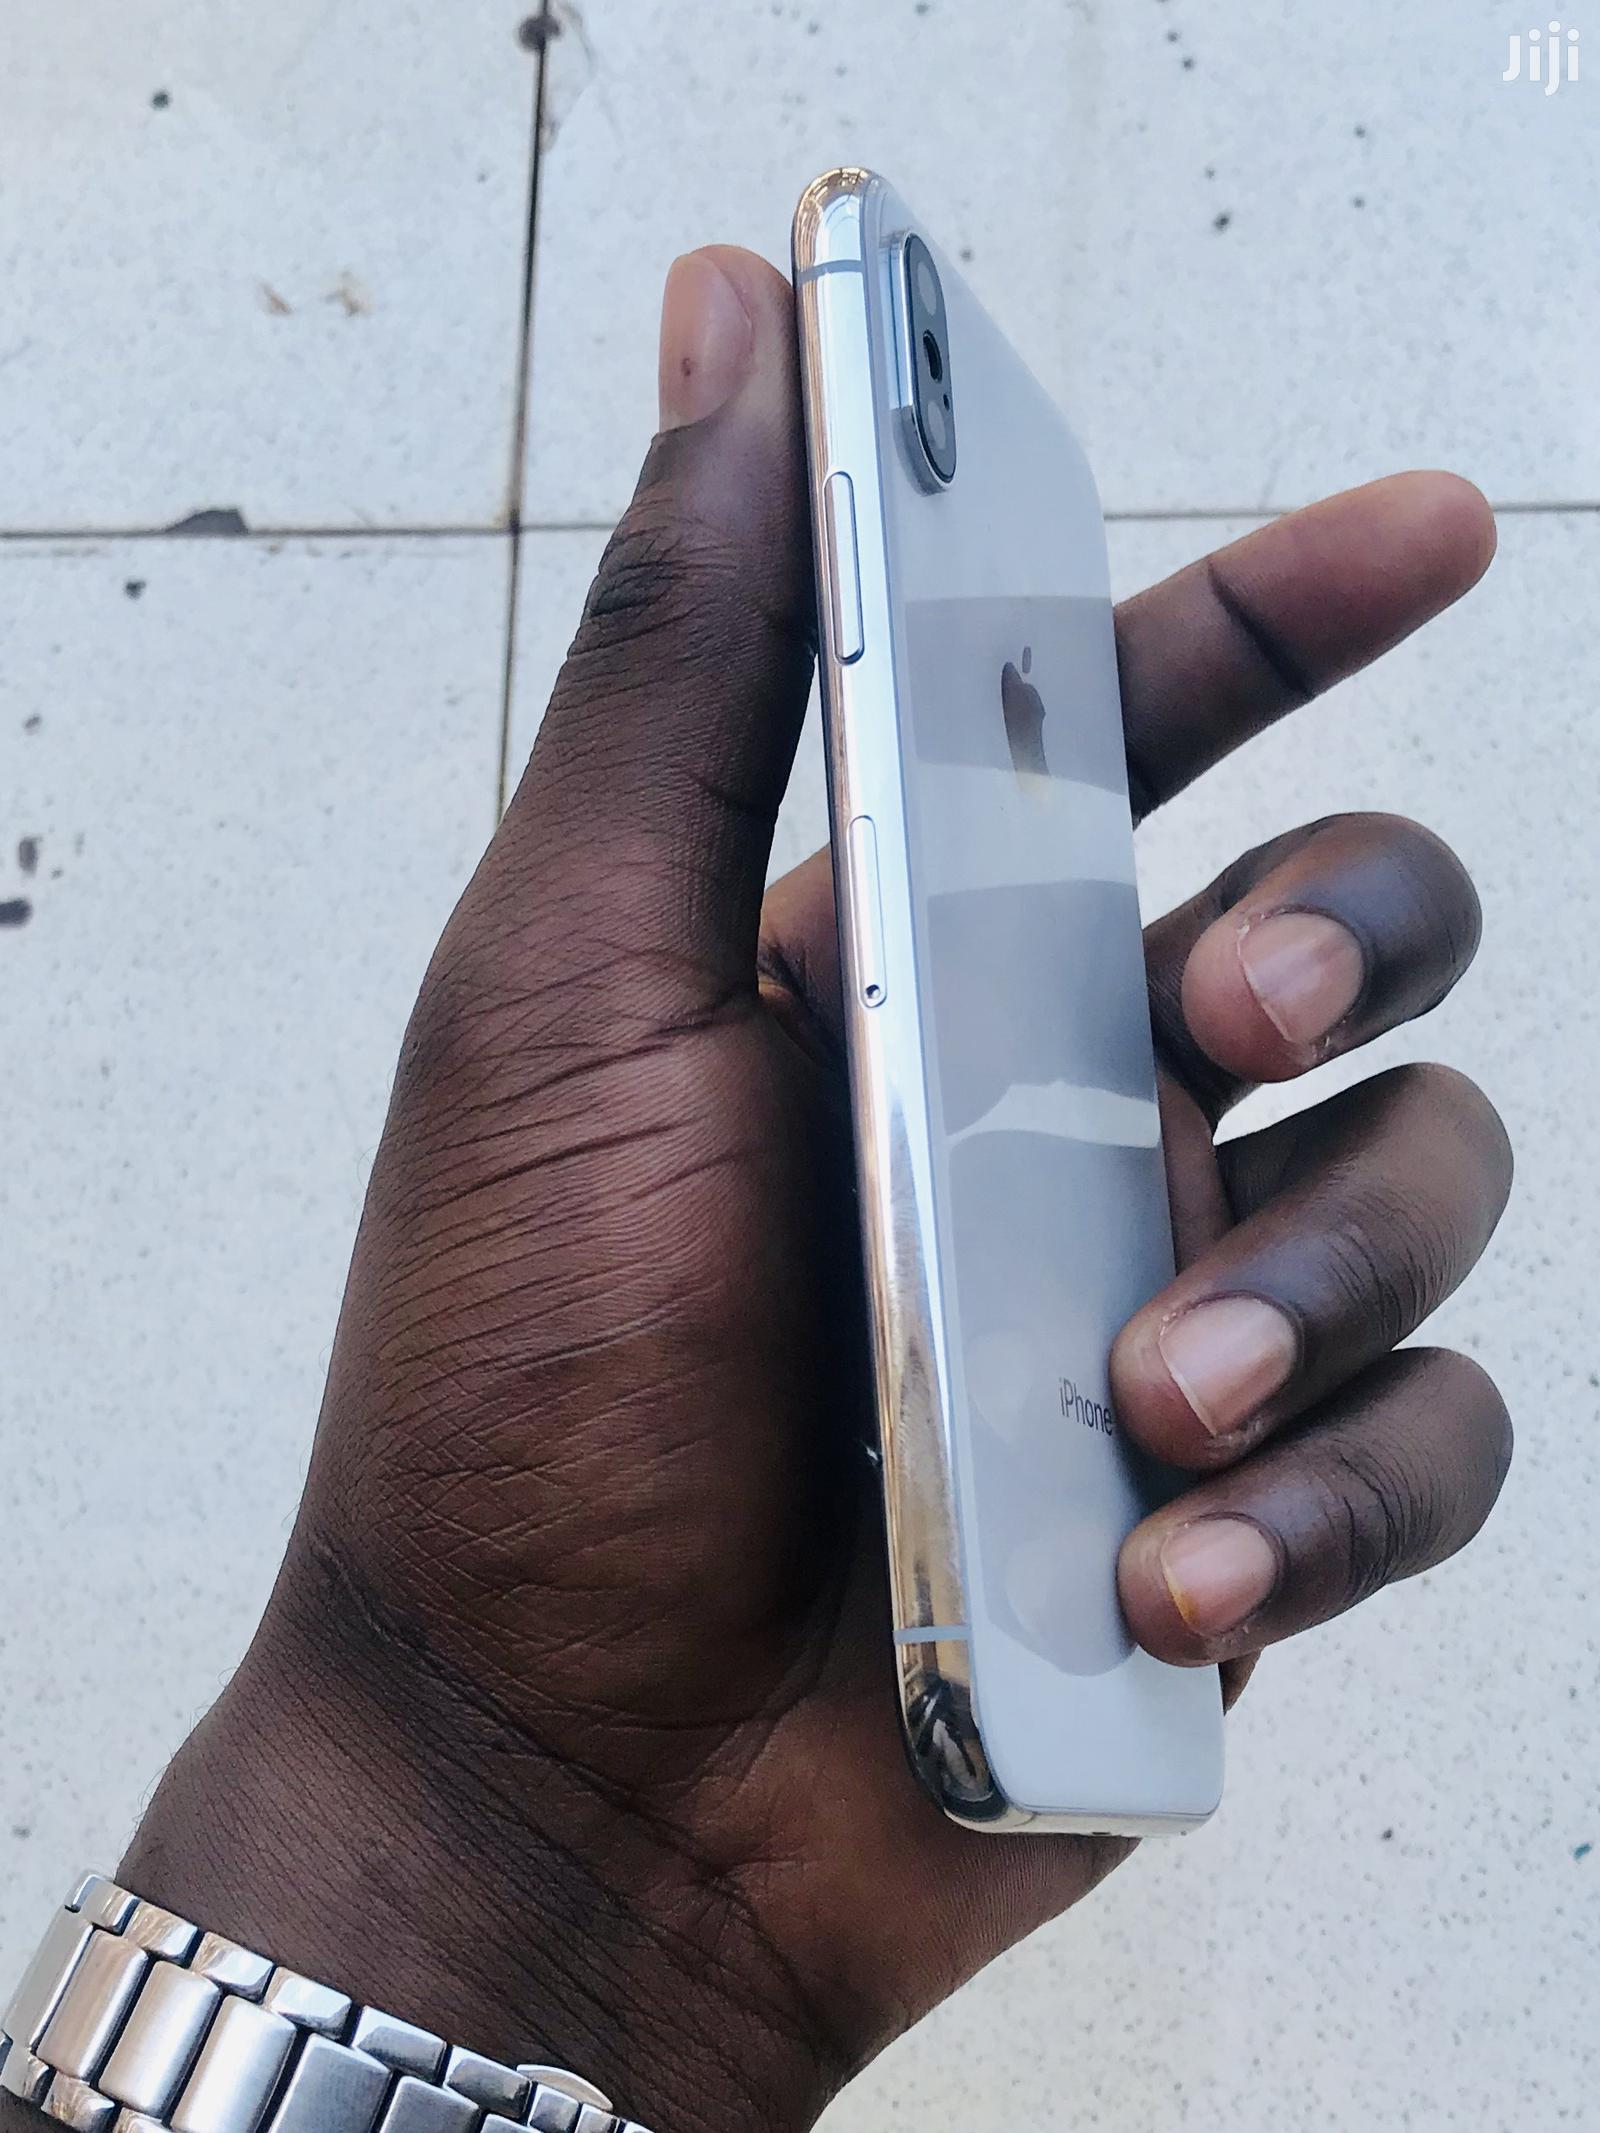 Apple iPhone X 64 GB Silver | Mobile Phones for sale in Kampala, Central Region, Uganda